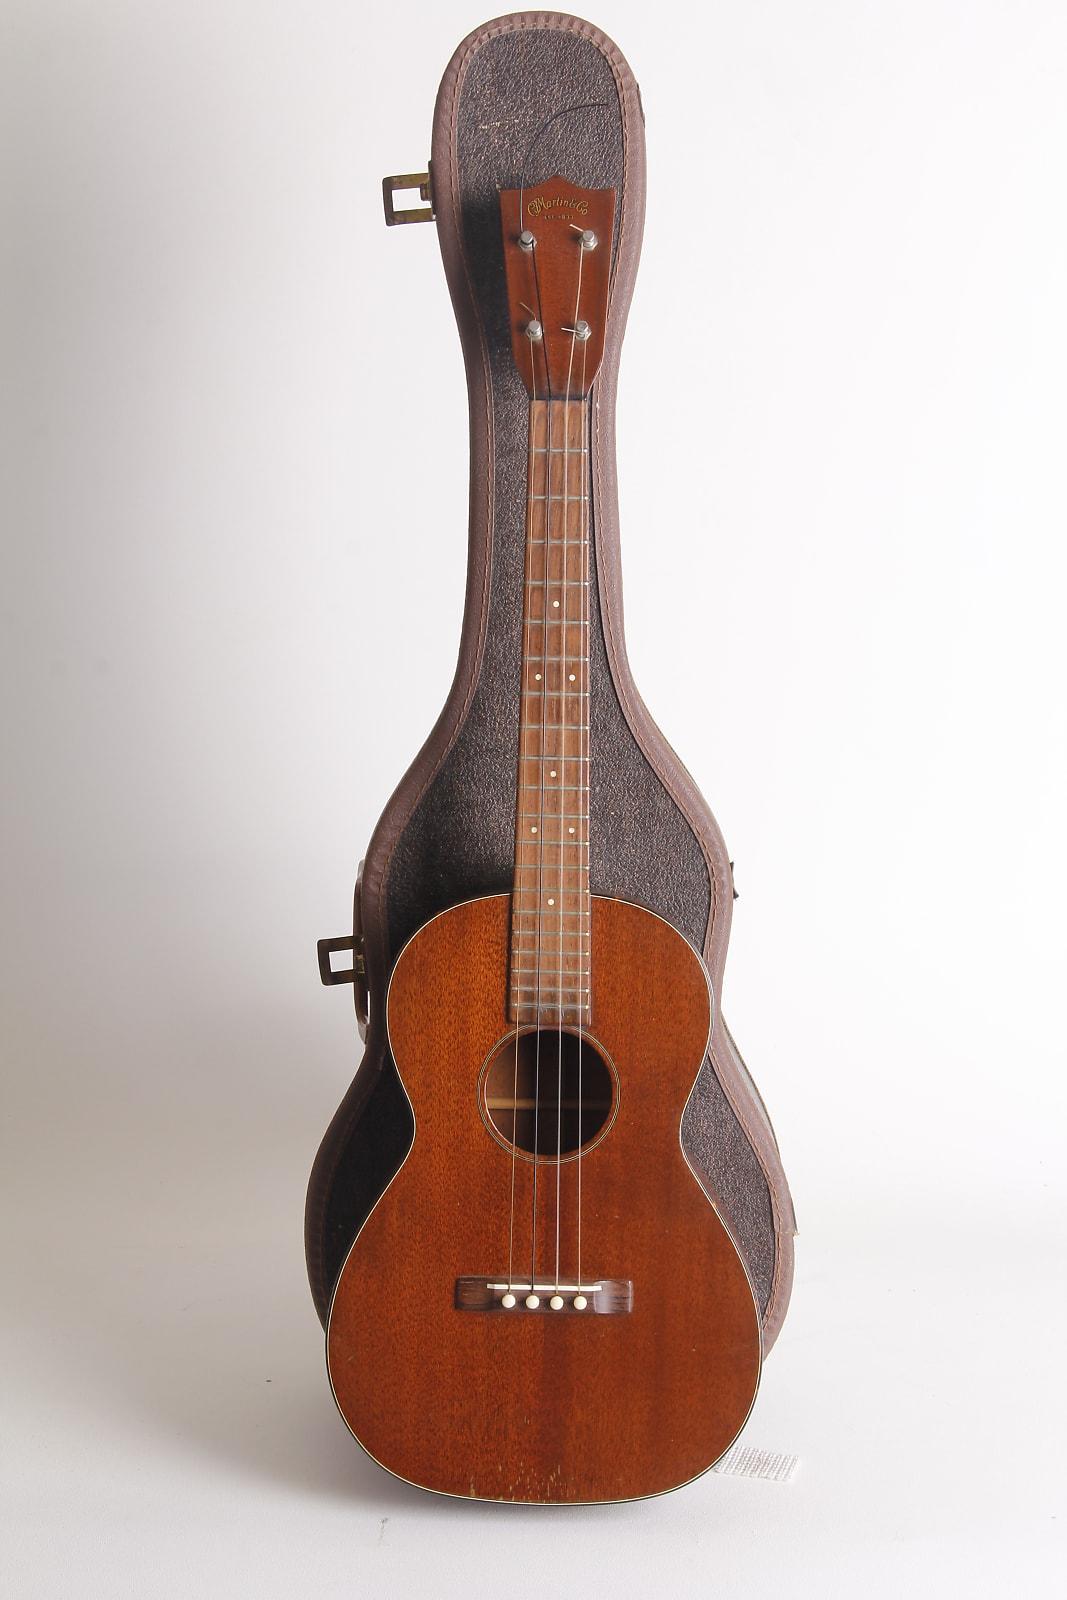 martin style 51 mahogany baritone ukulele reverb. Black Bedroom Furniture Sets. Home Design Ideas